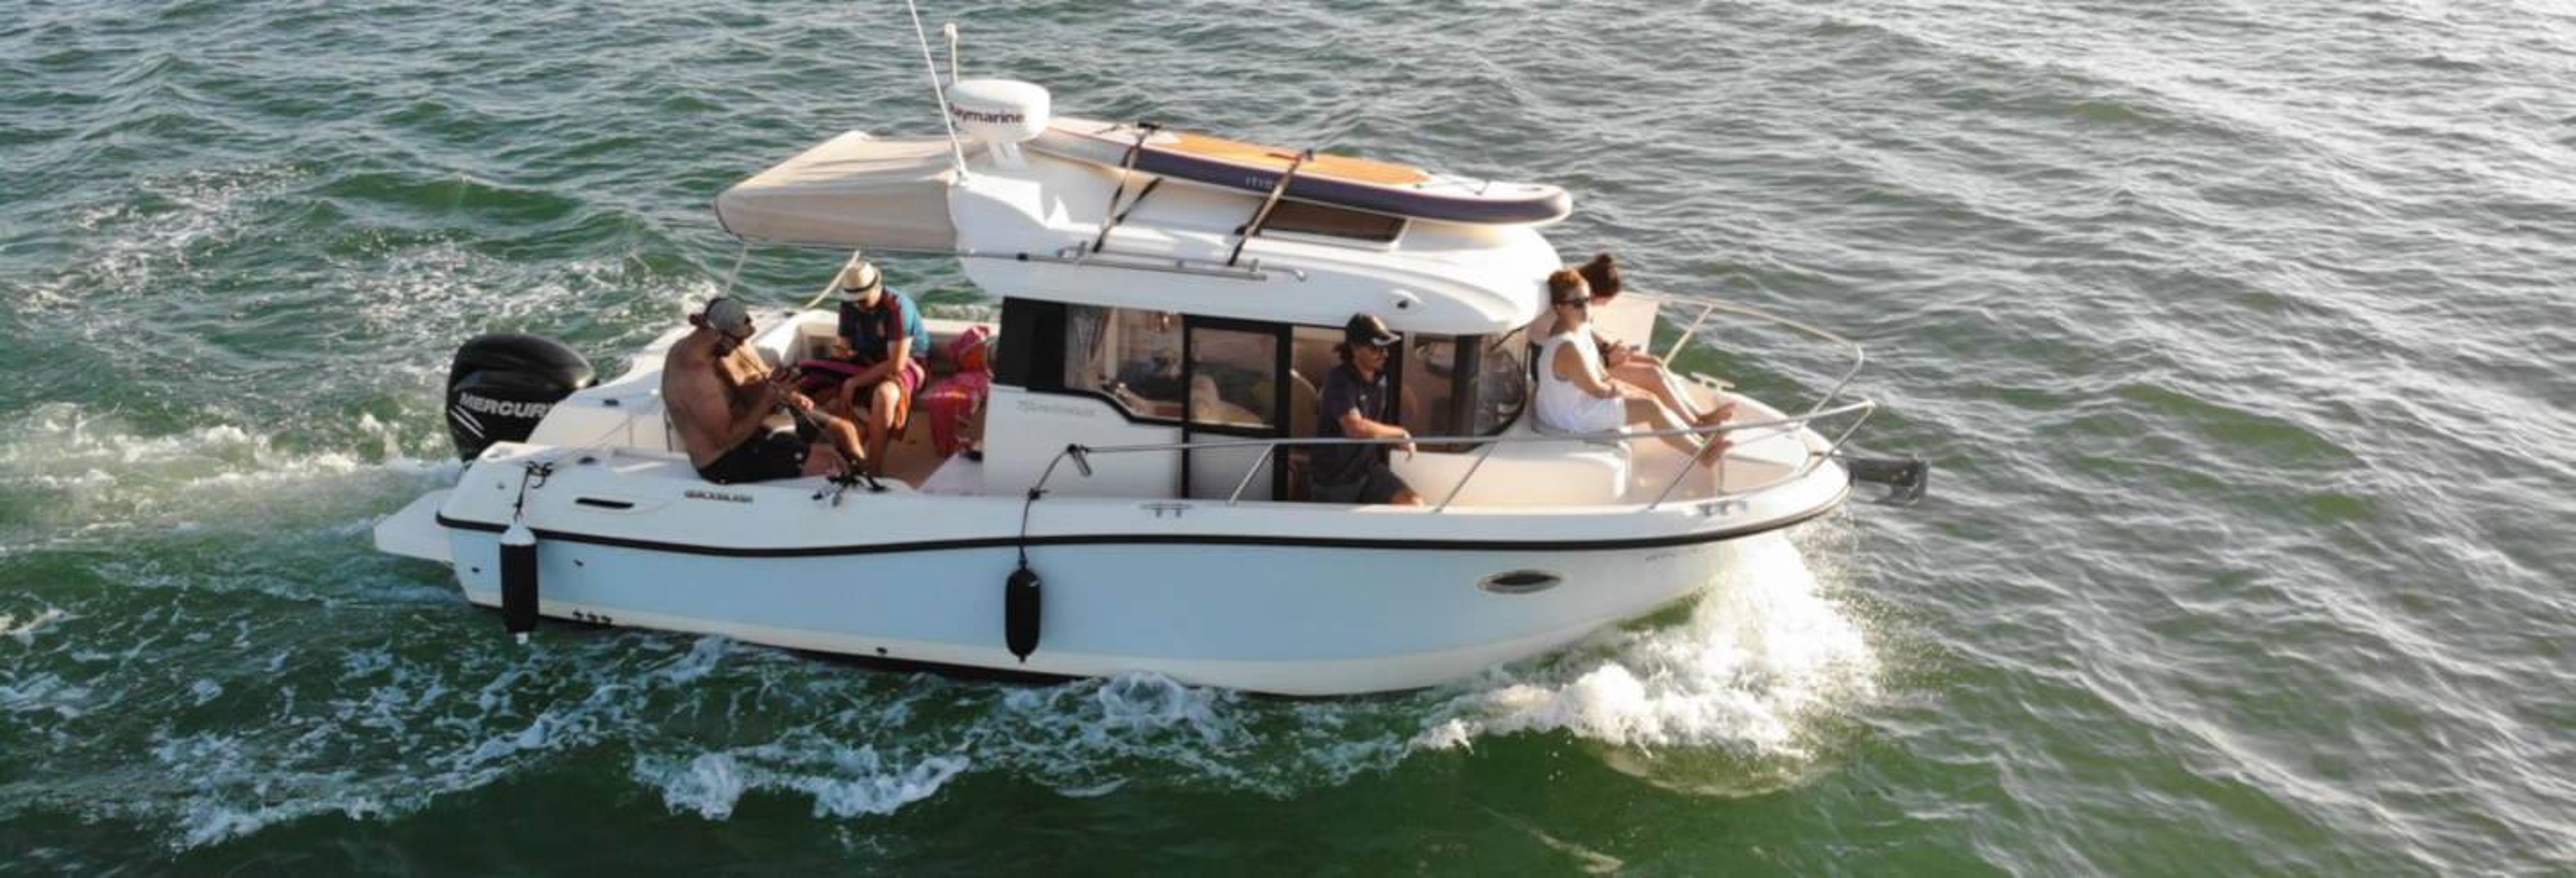 Giro in barca privata a Cadice